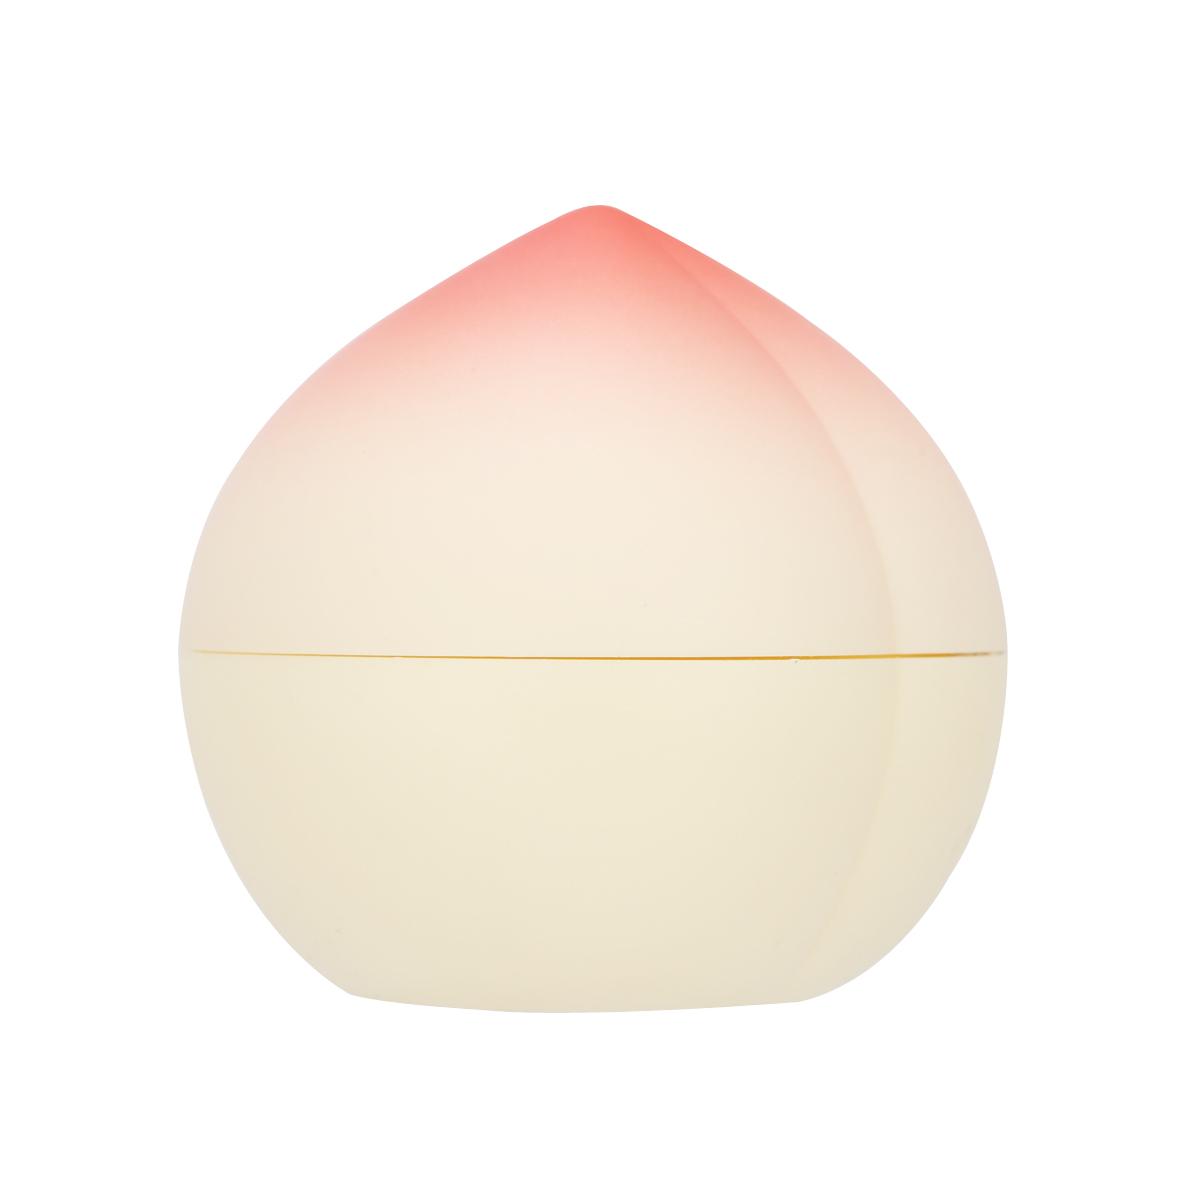 TonyMoly Крем для рук с персиком Peach Anti-Aging Hand Cream, 30 гр крем baviphat peach shake hand cream 35 мл